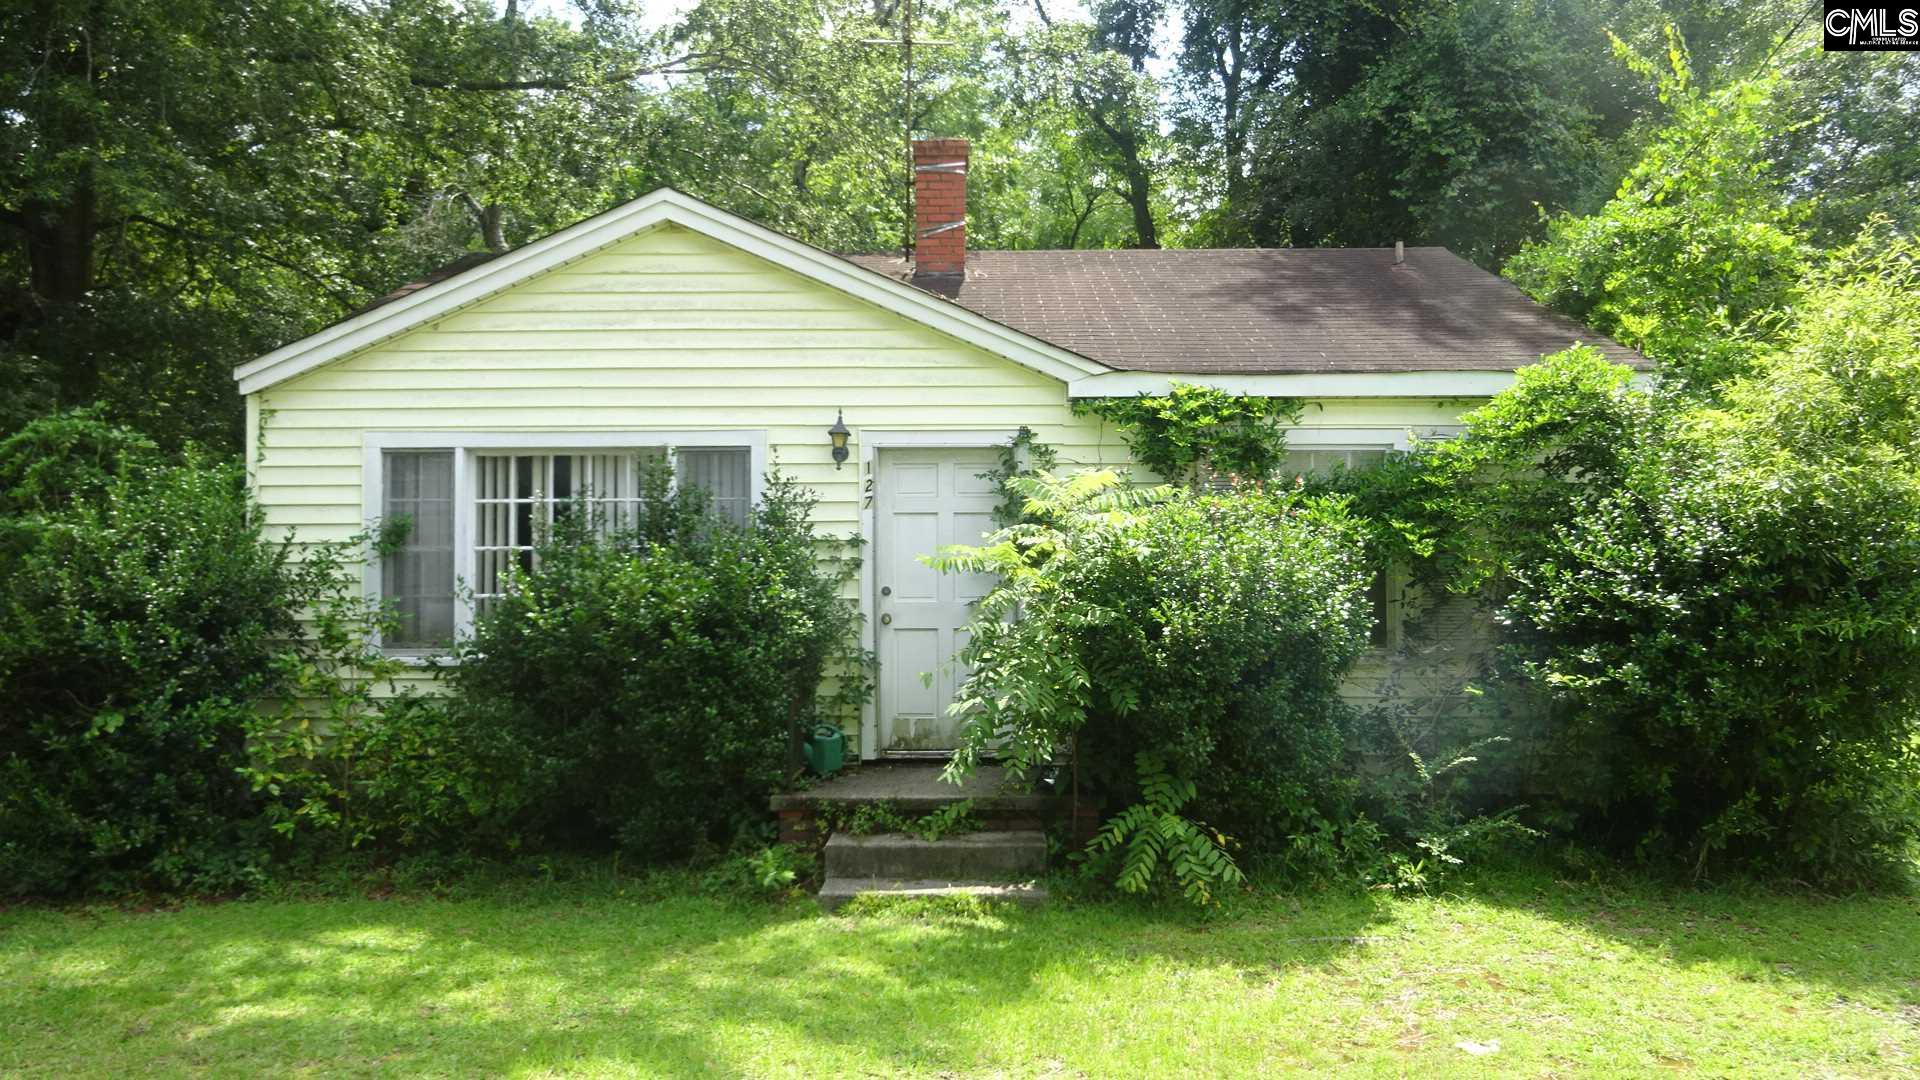 127 Aiken Street, Batesburg, SC, 29006 Primary Photo